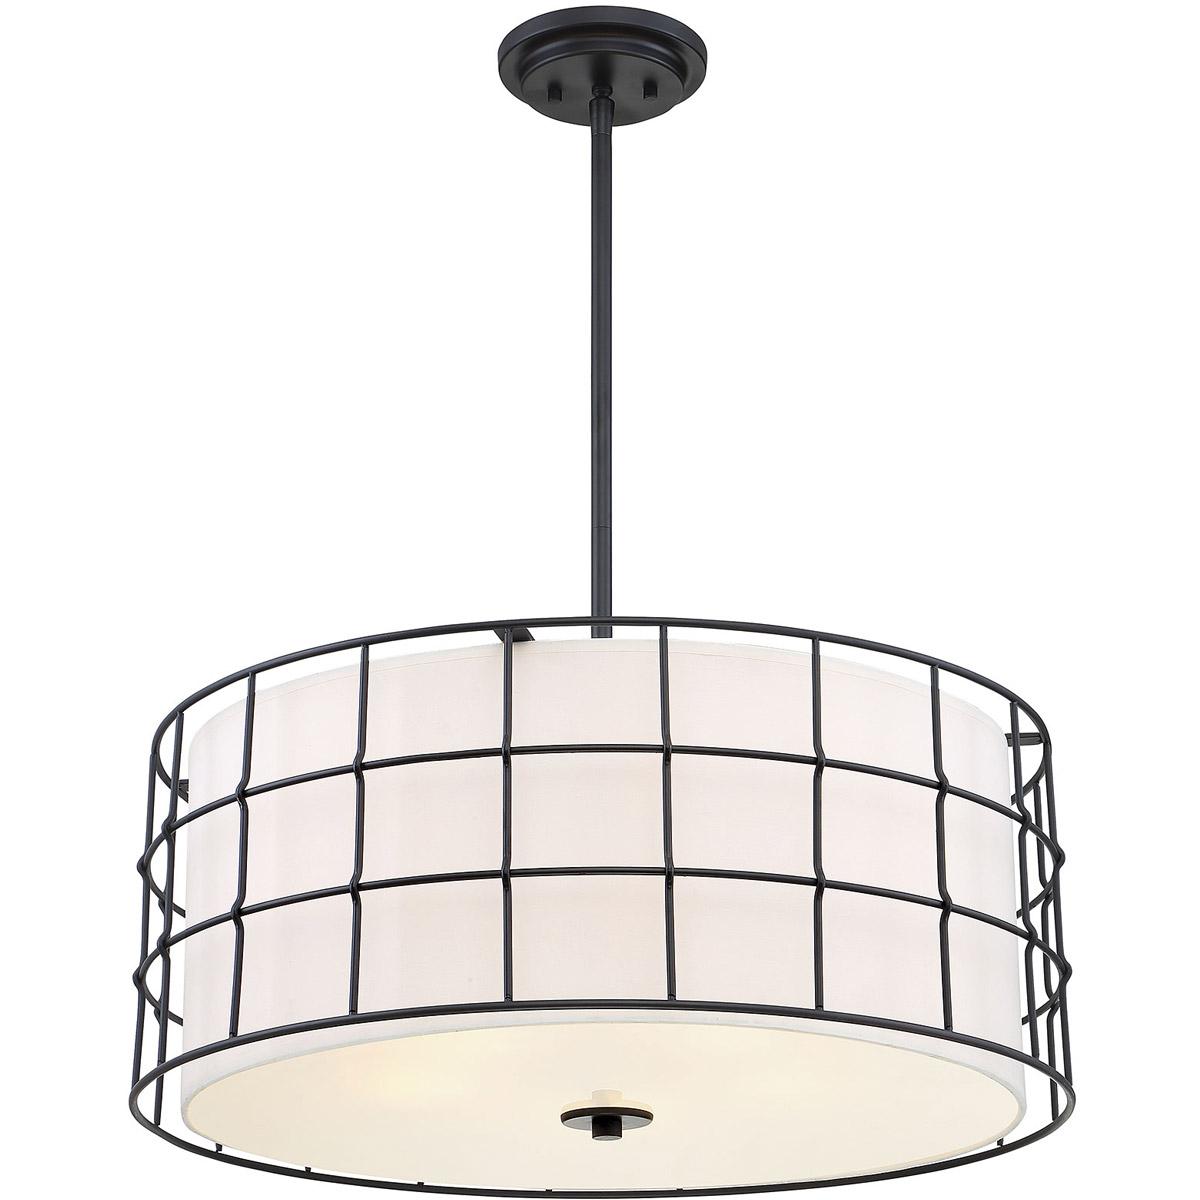 Current Details About Savoy House Lighting 7 8501 5 89 Hayden Pendant Black Regarding Hayden 5 Light Shaded Chandeliers (View 18 of 20)